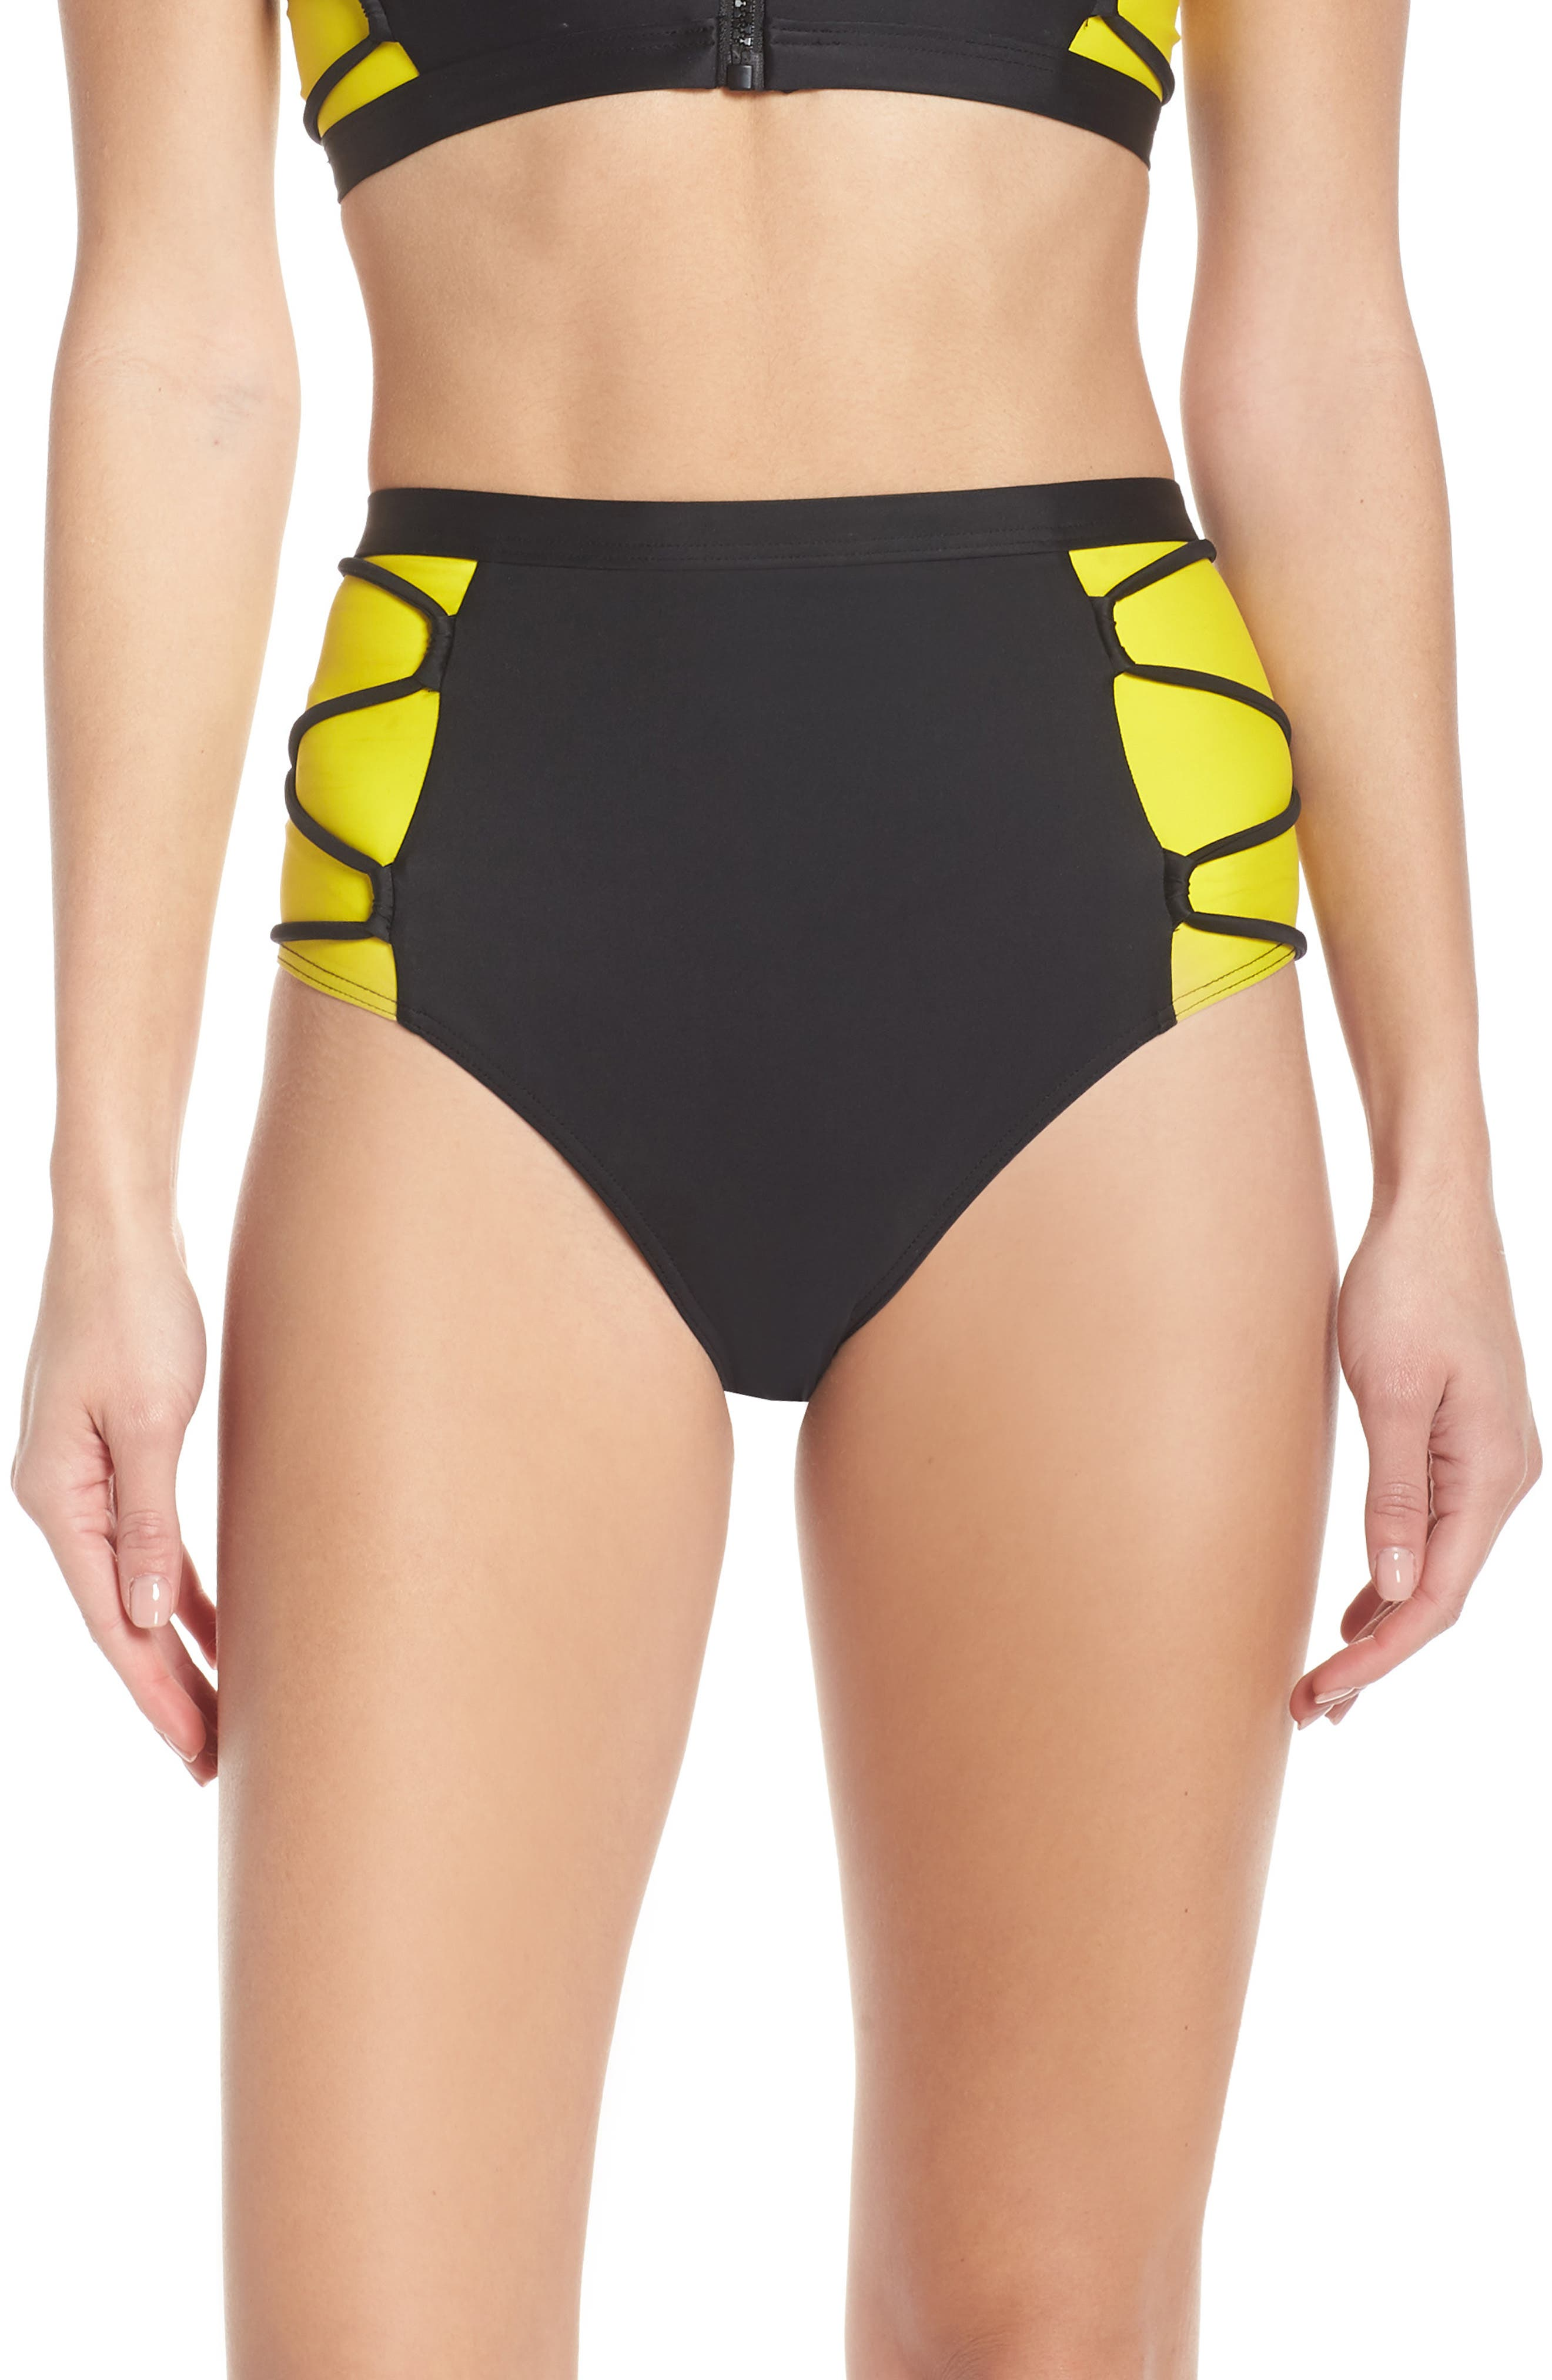 Chromat Launch Bikini Bottoms, Black